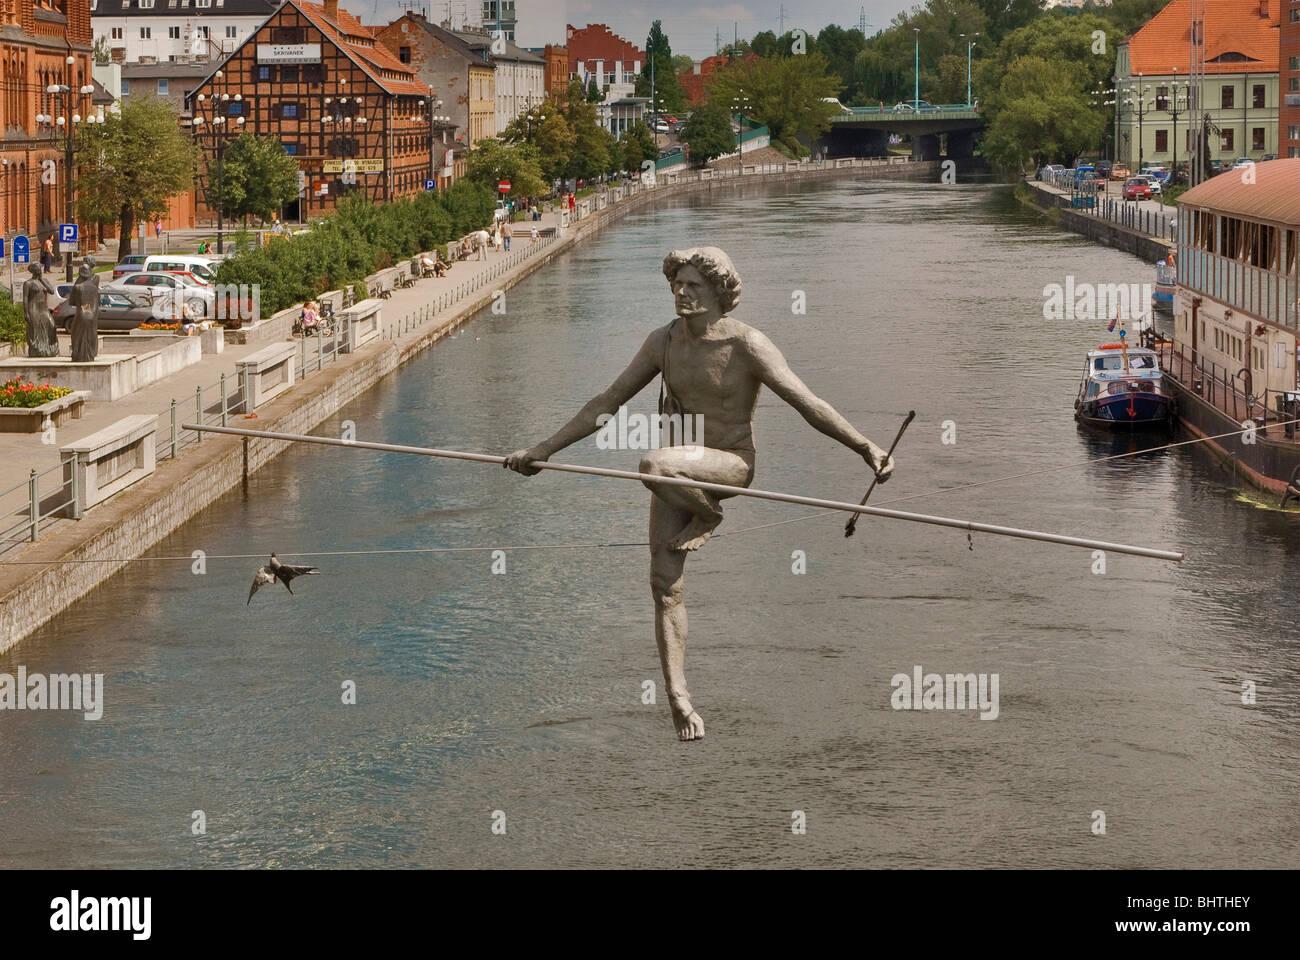 Crossing the River sculpture over Brda river at Bydgoszcz, Kujawsko-Pomorskie, Poland Stock Photo